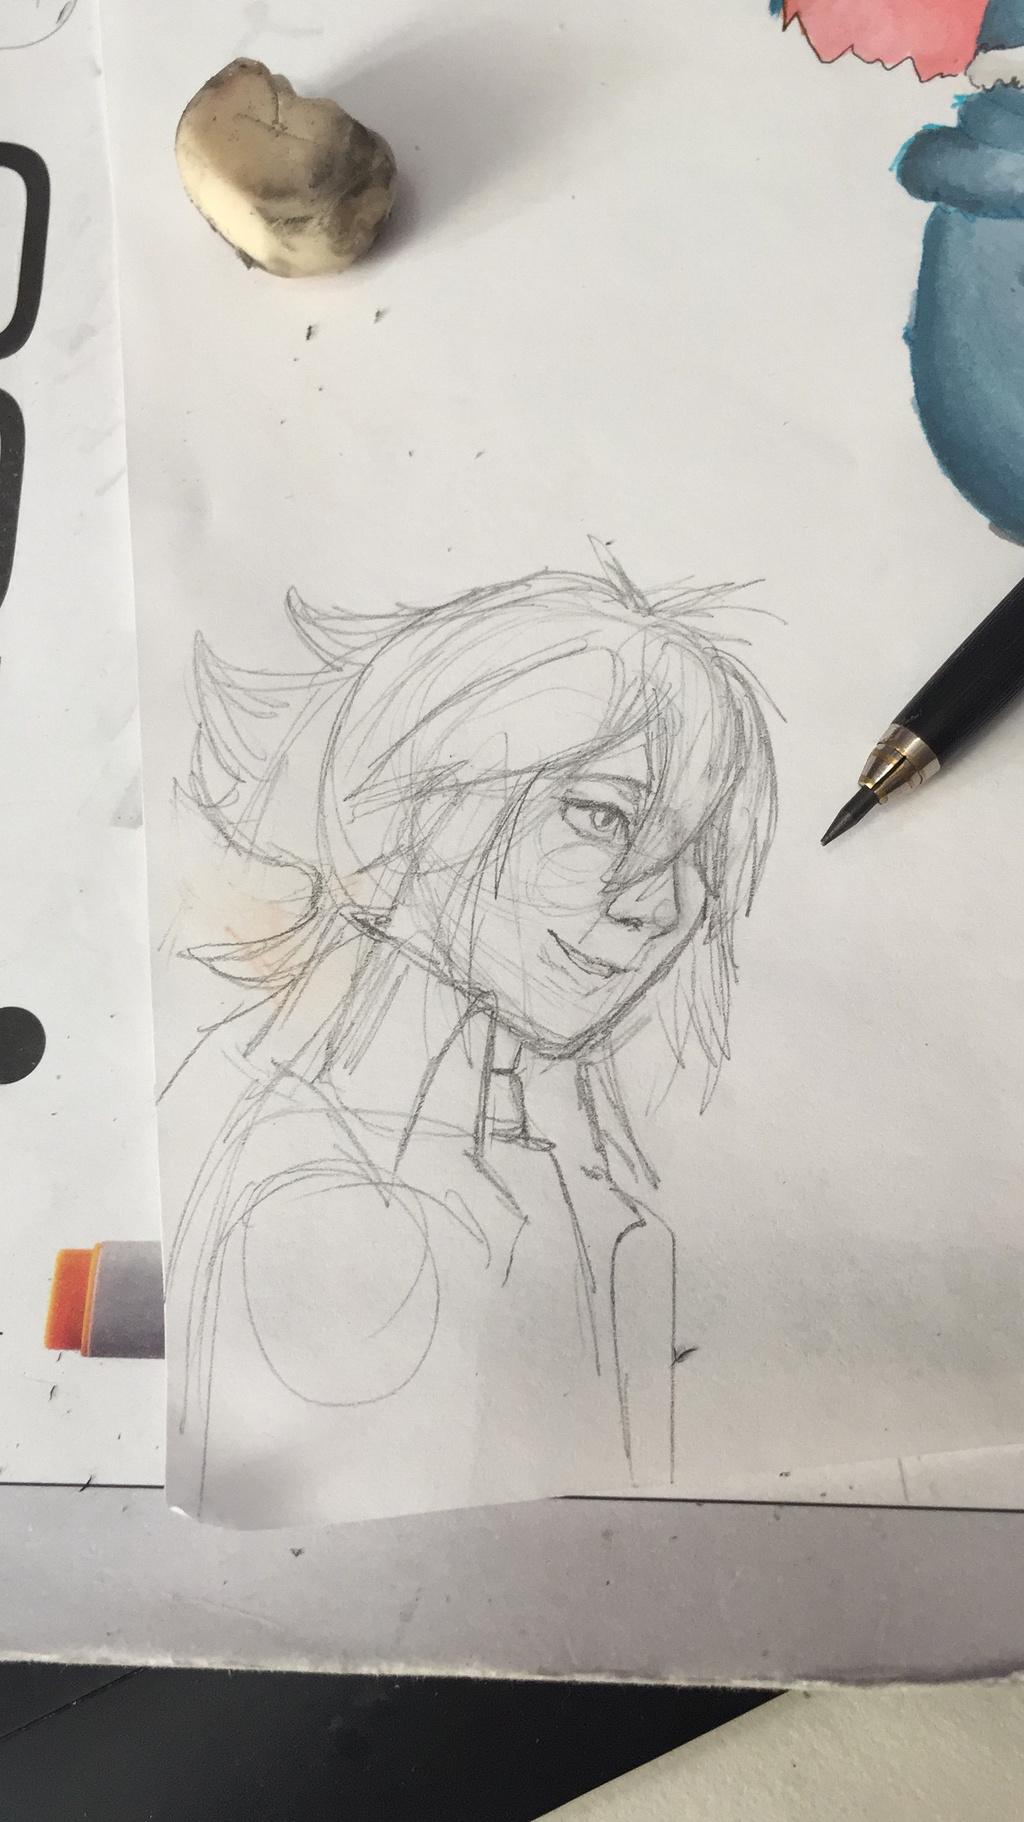 N - Pokémon [Commission/Sketch] 4/???